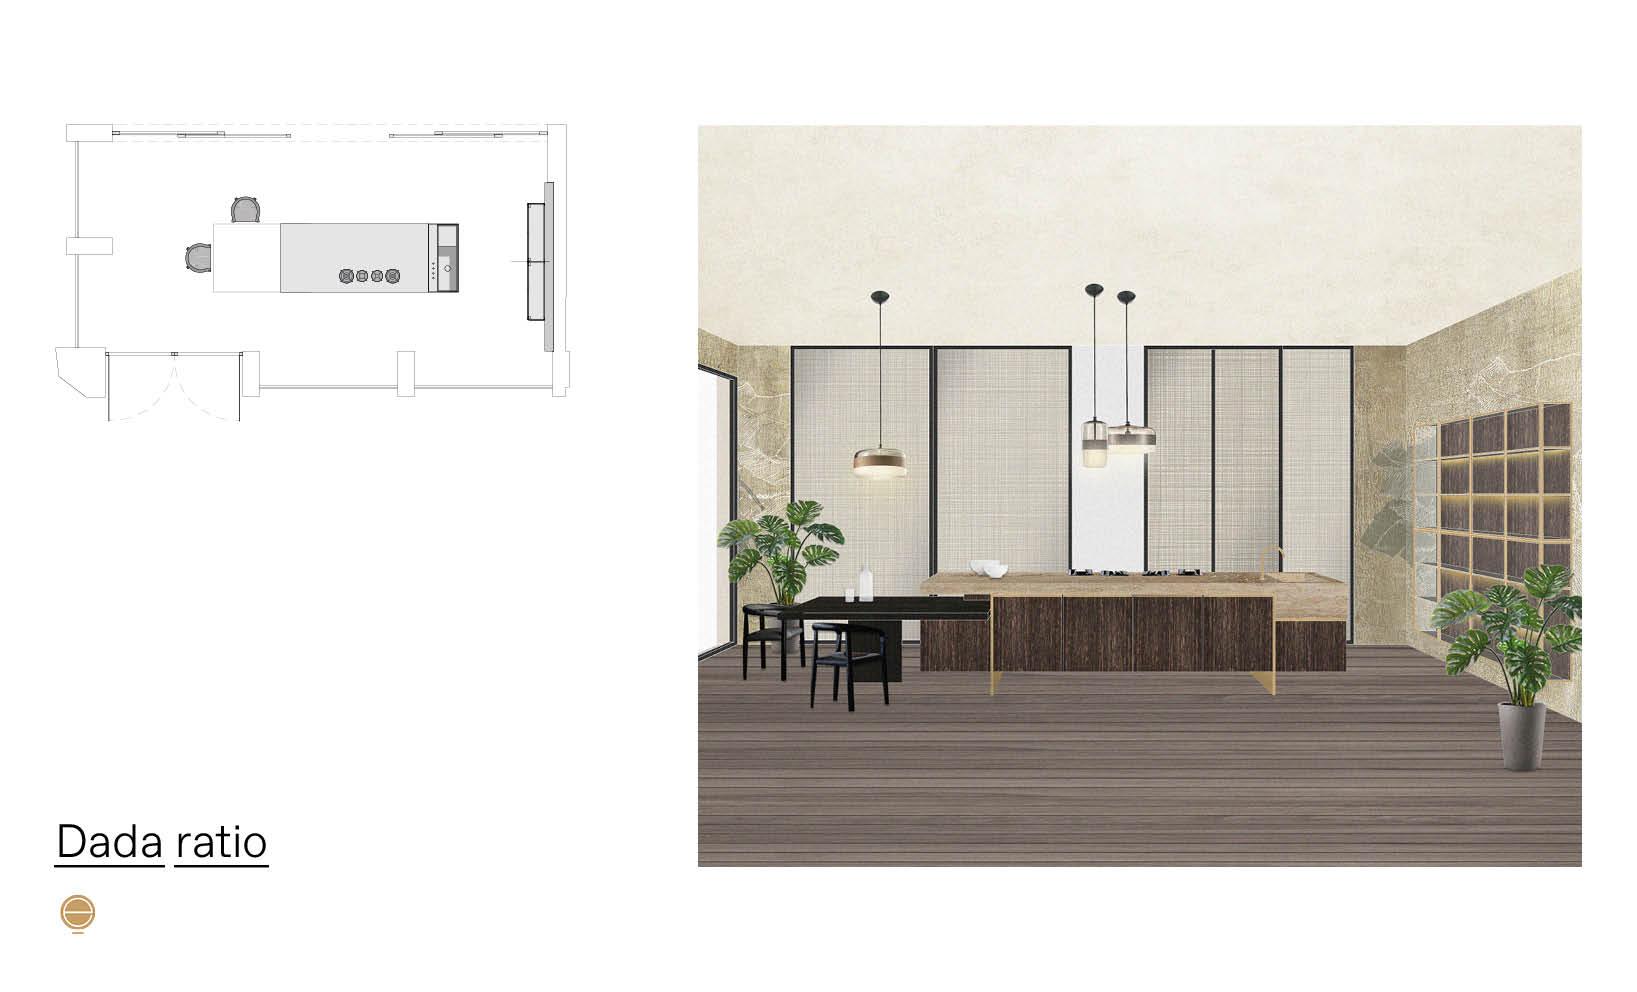 luxury Italian kitchens and dada ratio project inspiration designed by Esperiri